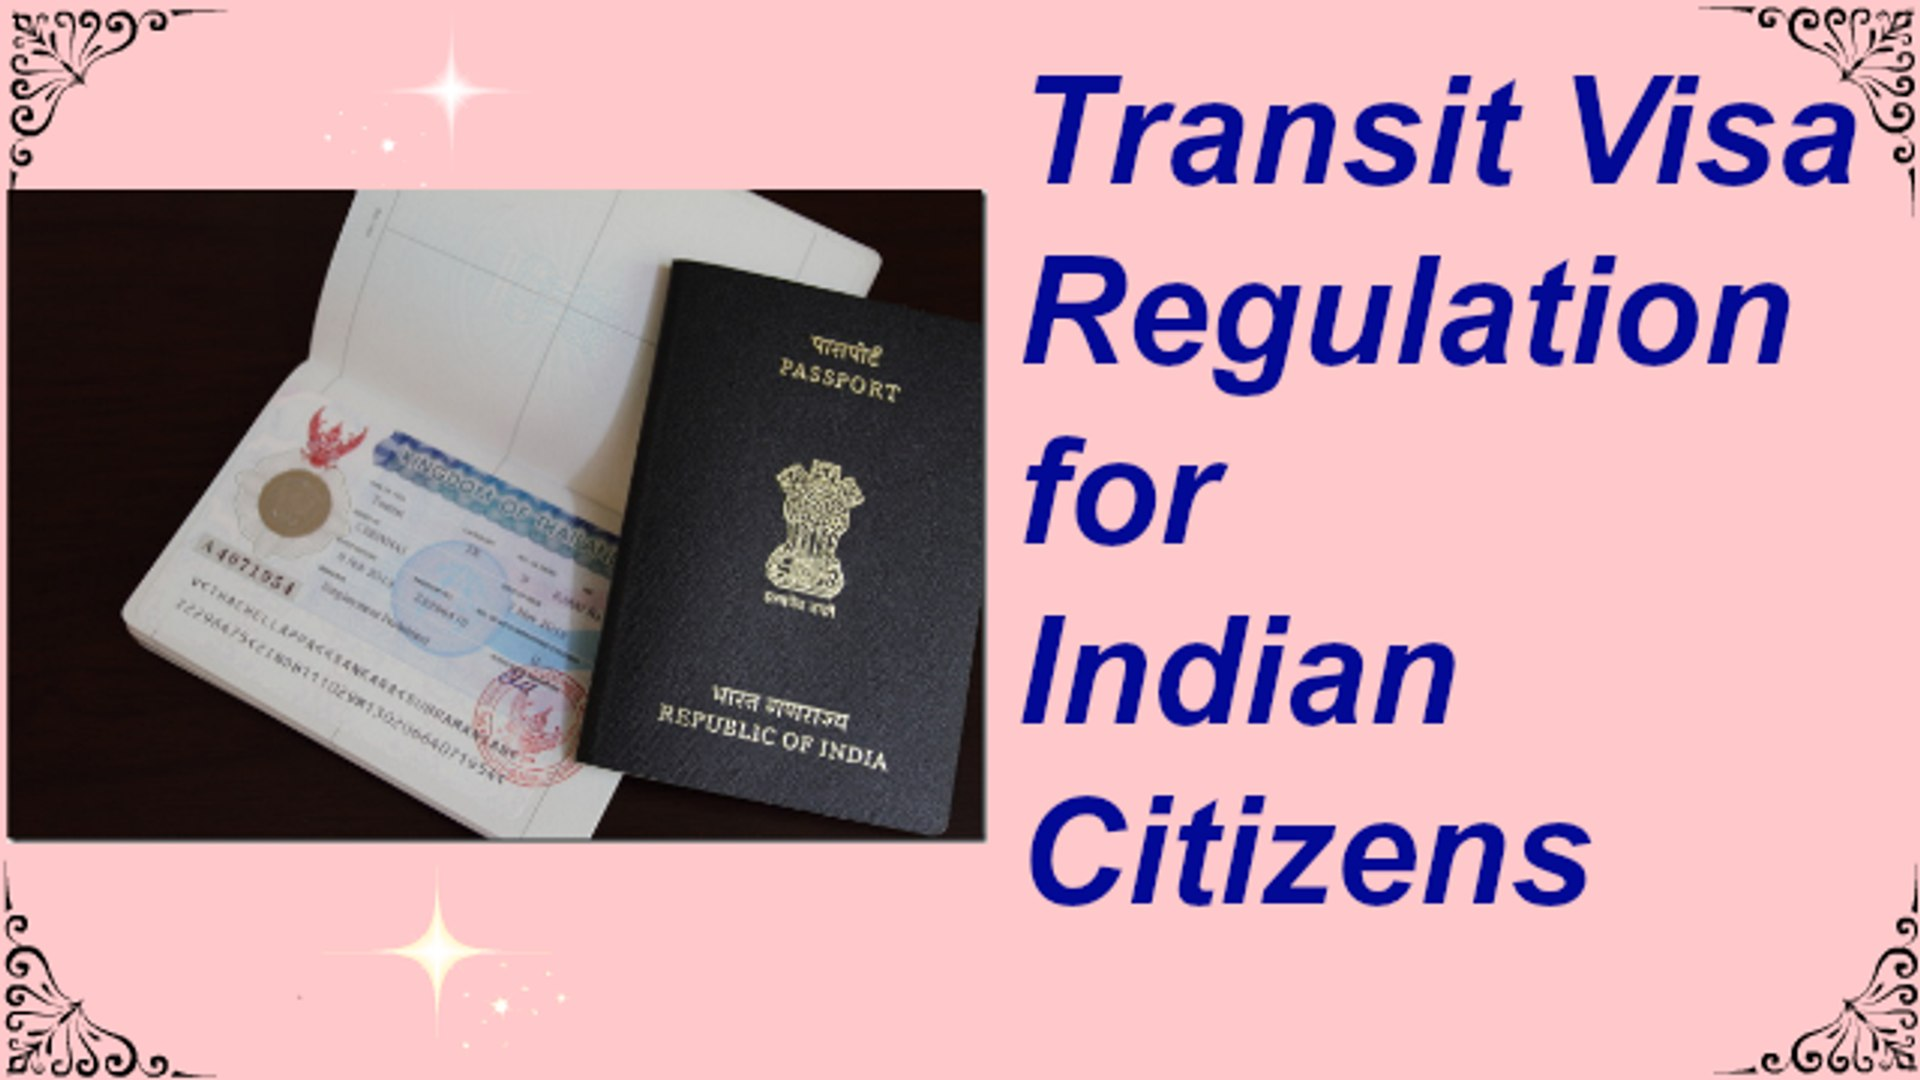 Transit Visa Regulations for Indian Citizens